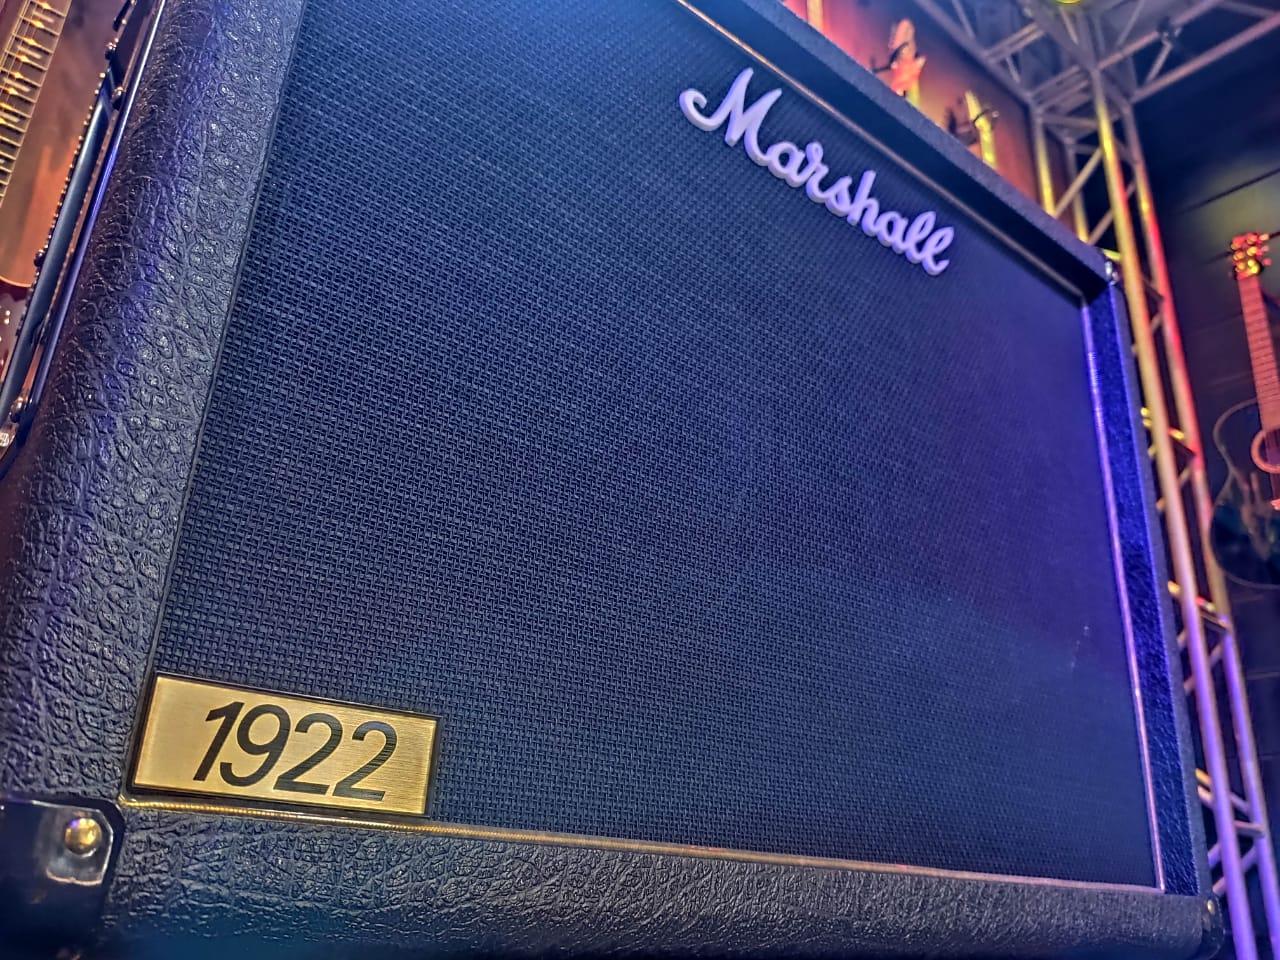 Gabinete Guitarra Marshall 1922 2x12 150w - Outlet Premium